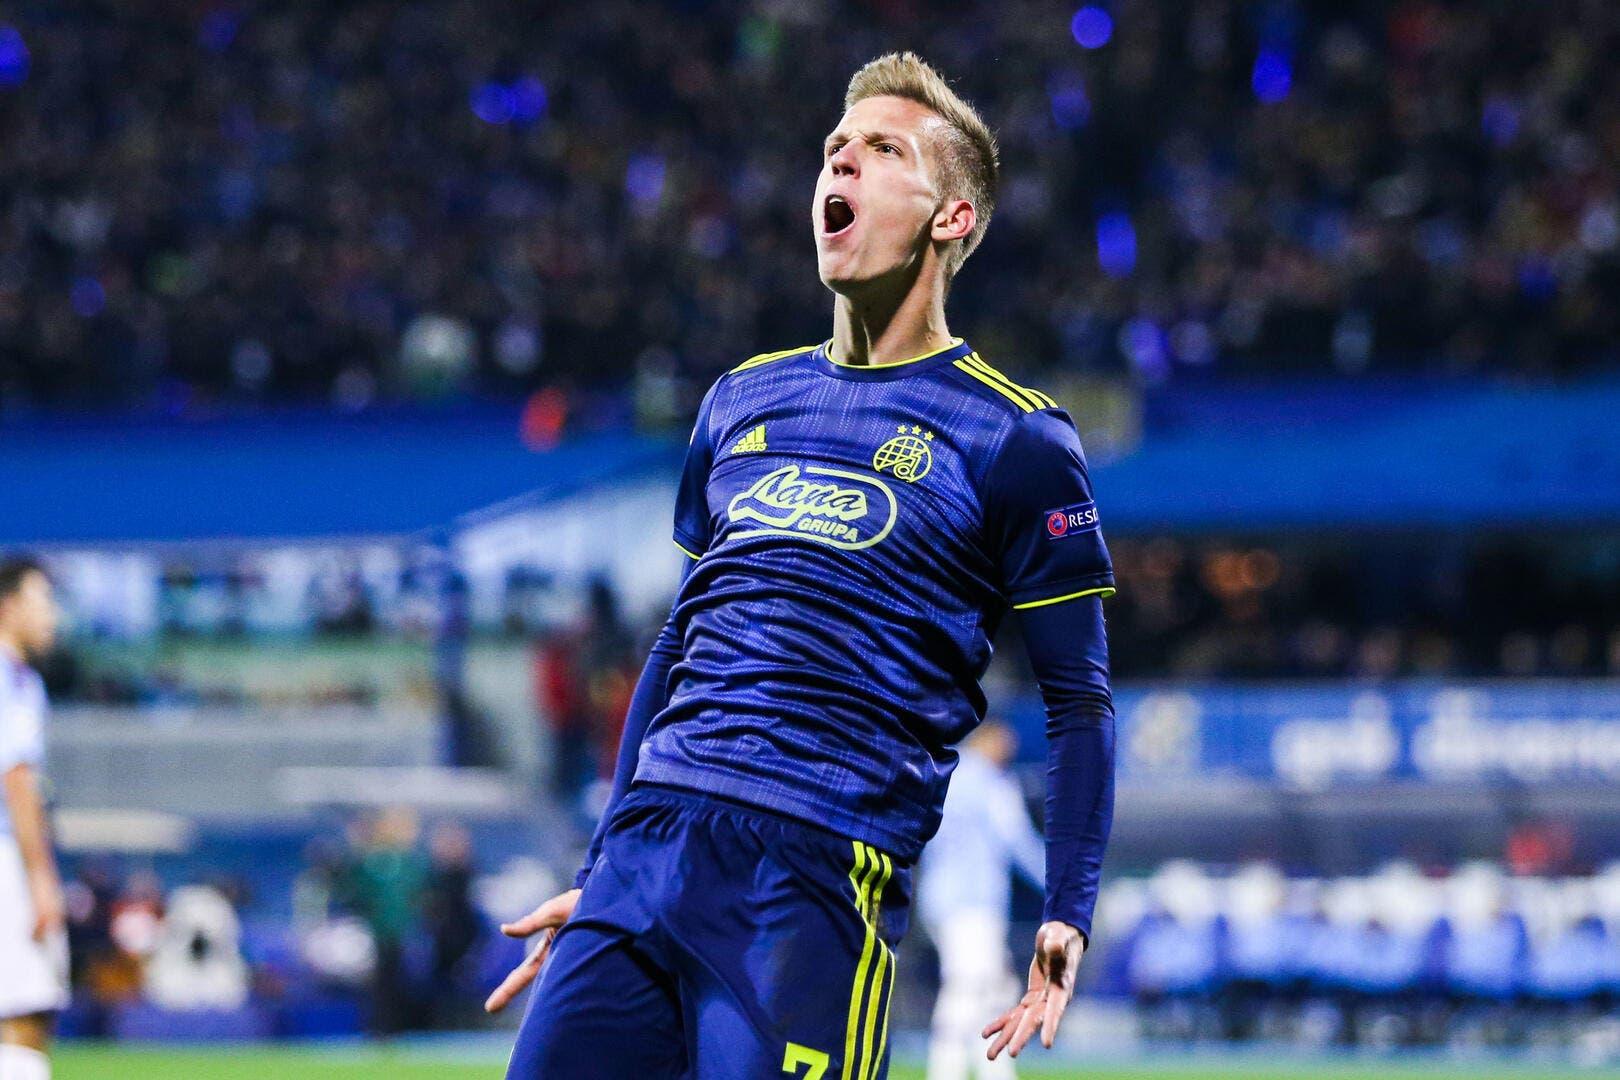 Mercato : OL, Leipzig, Barça, Dani Olmo affole l'Europe